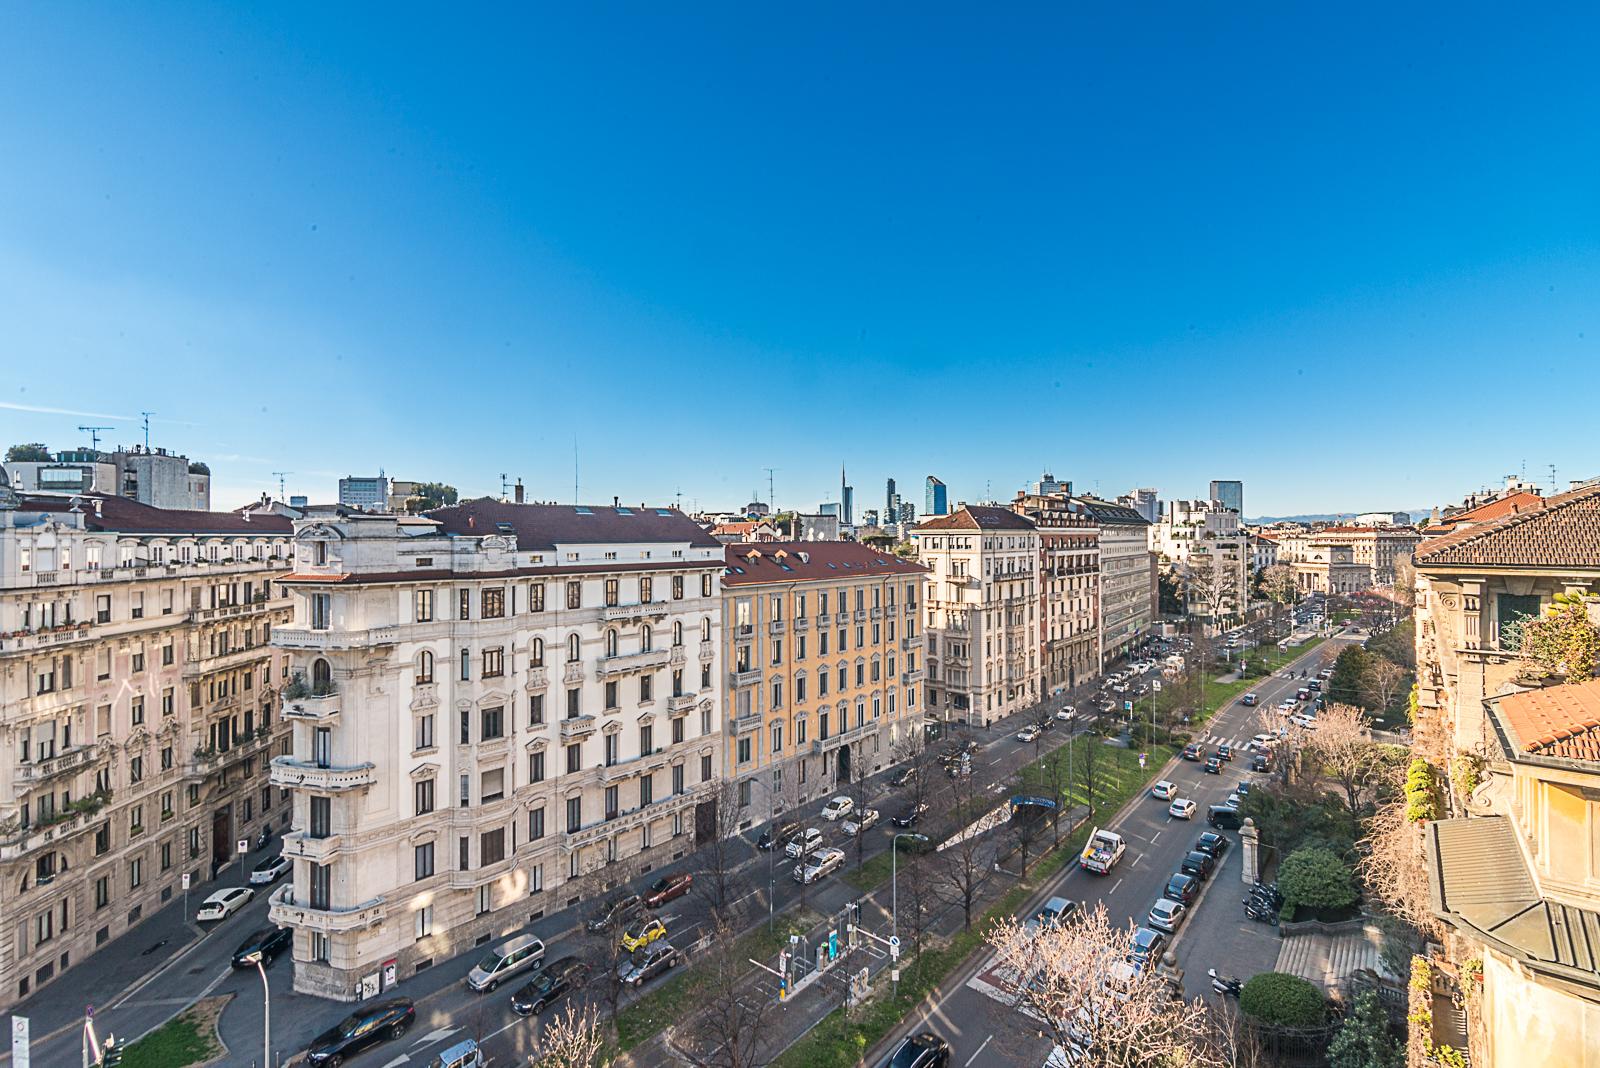 Apartment for Sale at Majestic penthouse with views of Milan Viale Luigi Majno Milano, Milan, 20129 Italy